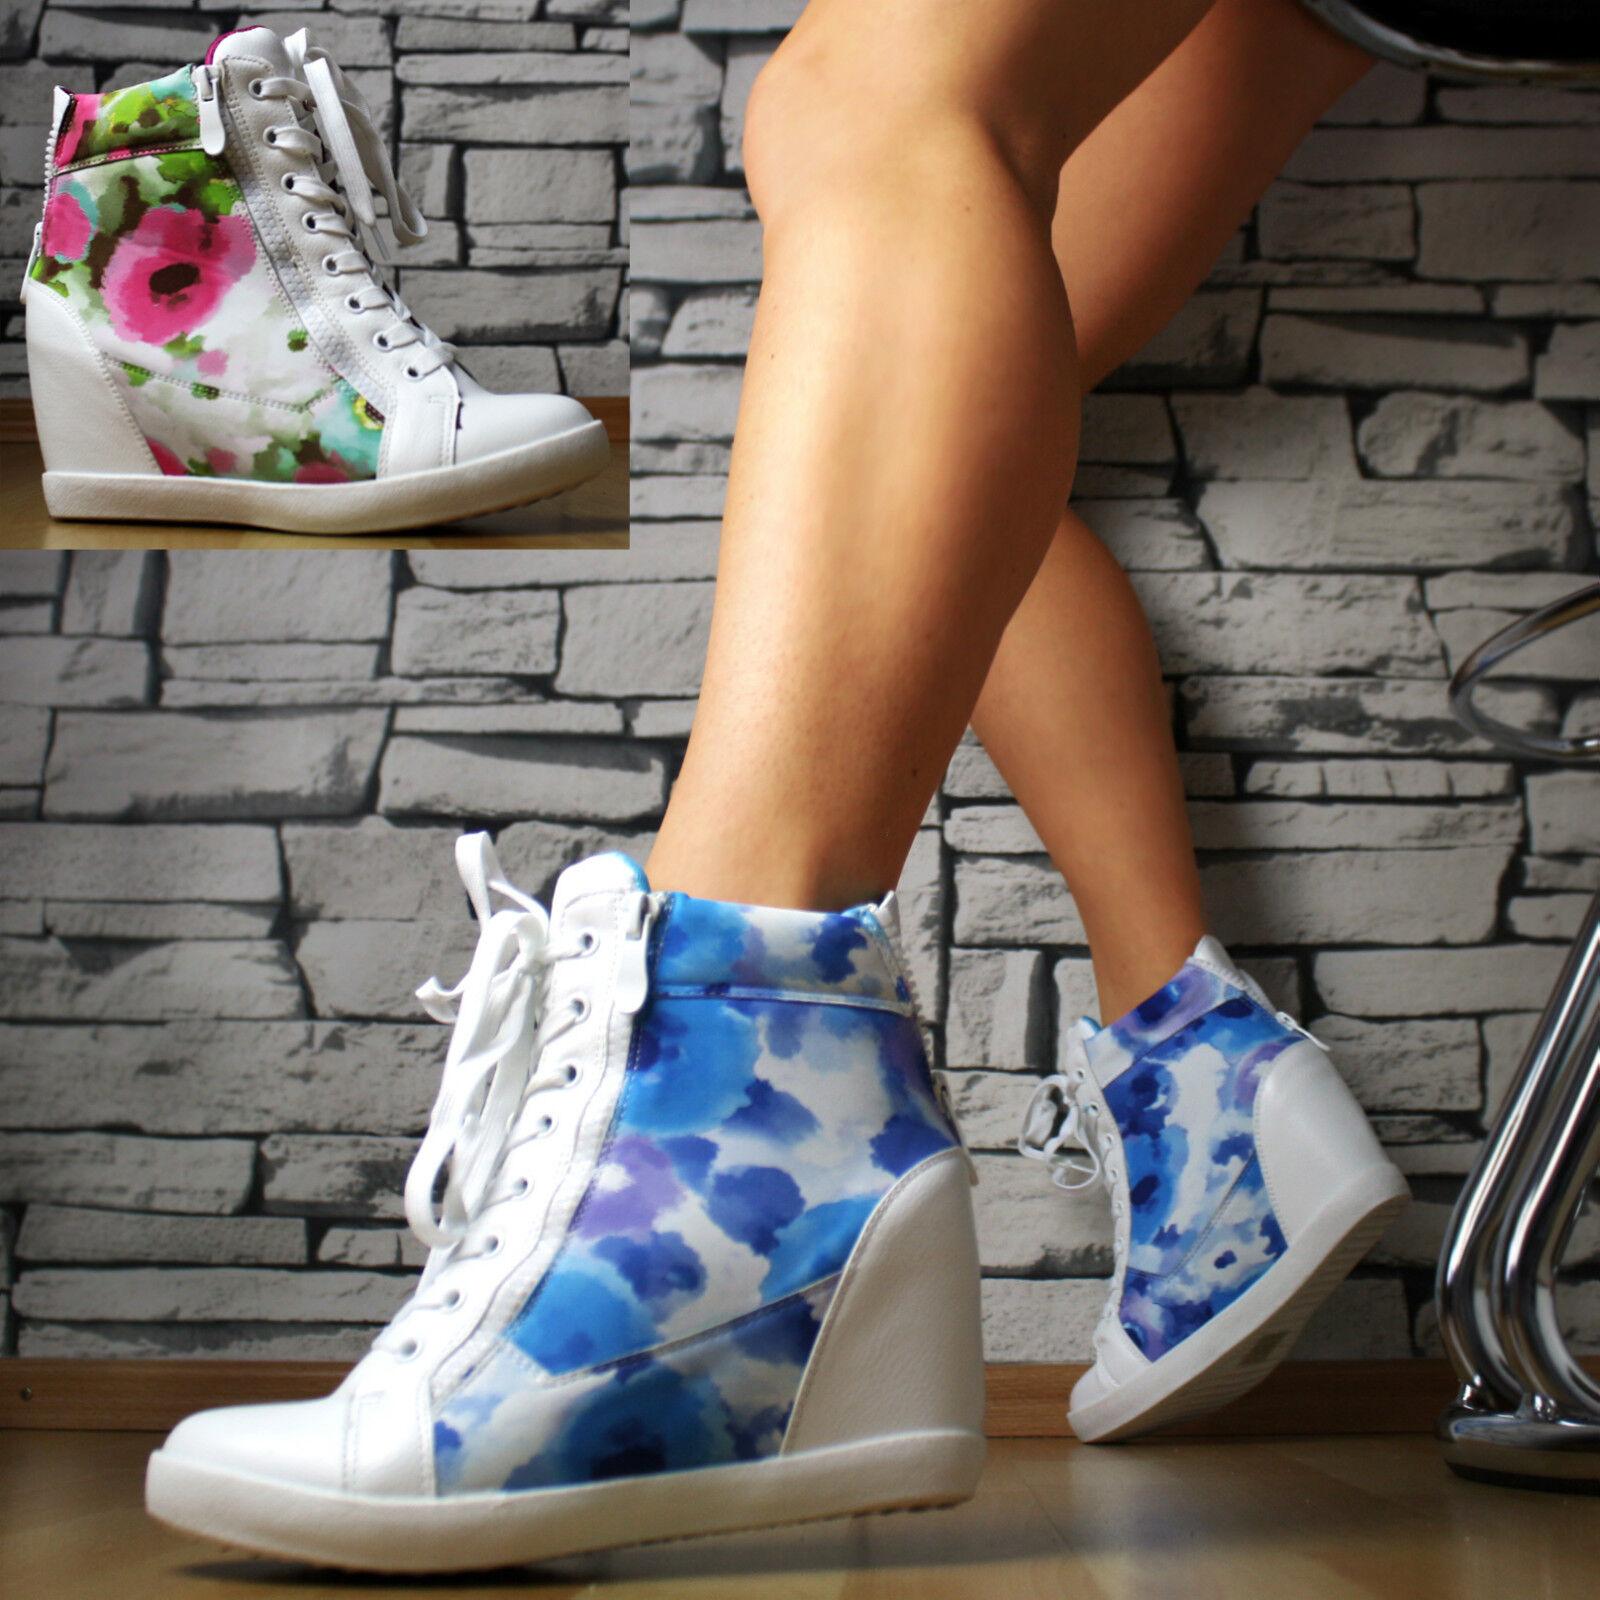 Designer Luxus Sneaker Keilabsatz Wedges Blumen Damen Schuhe Stiefeletten SeXy